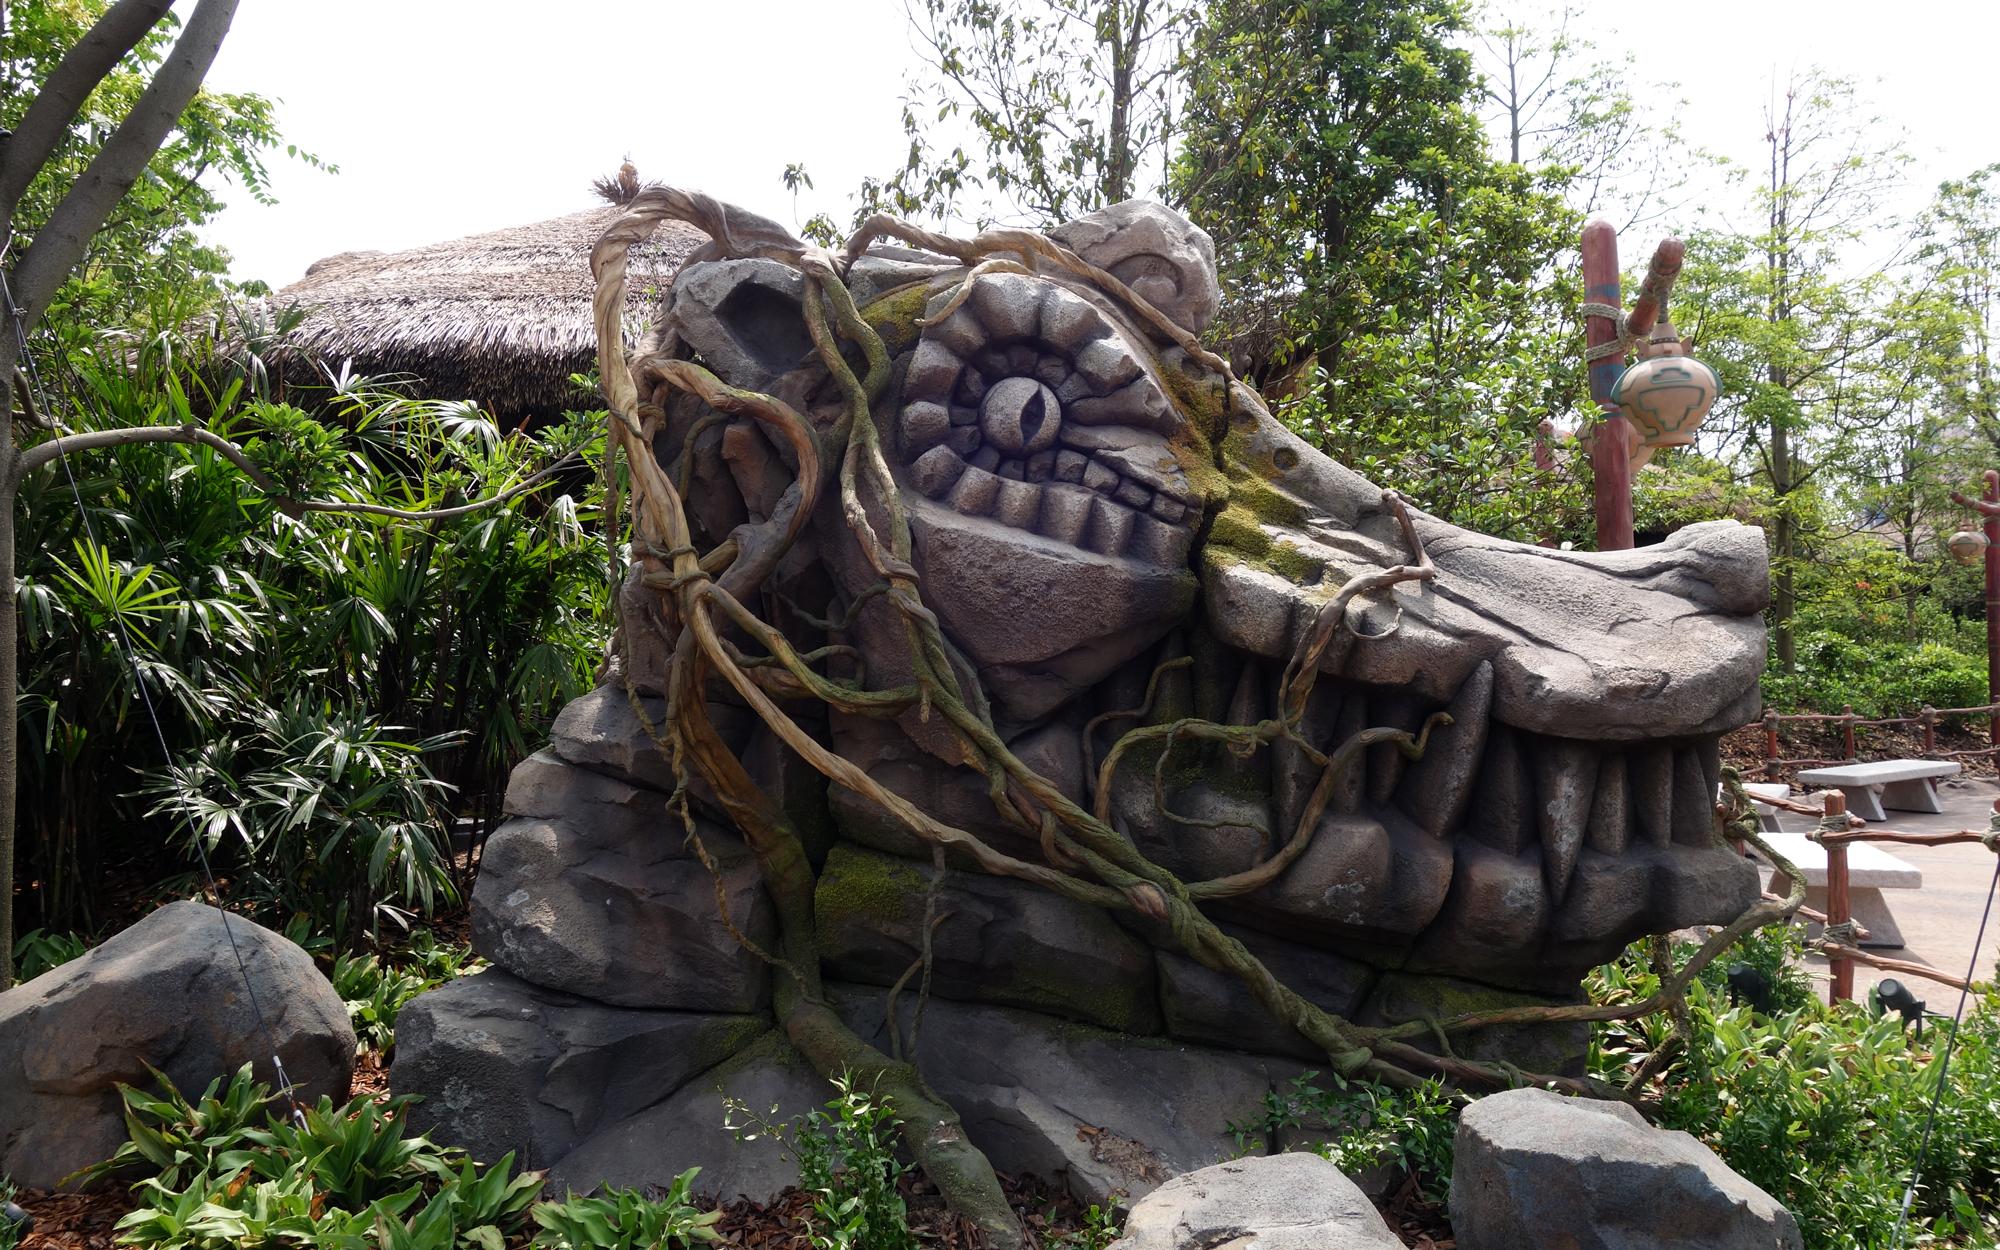 Shanghai-Disney-Scenes-04-EXCLUSIVE0616